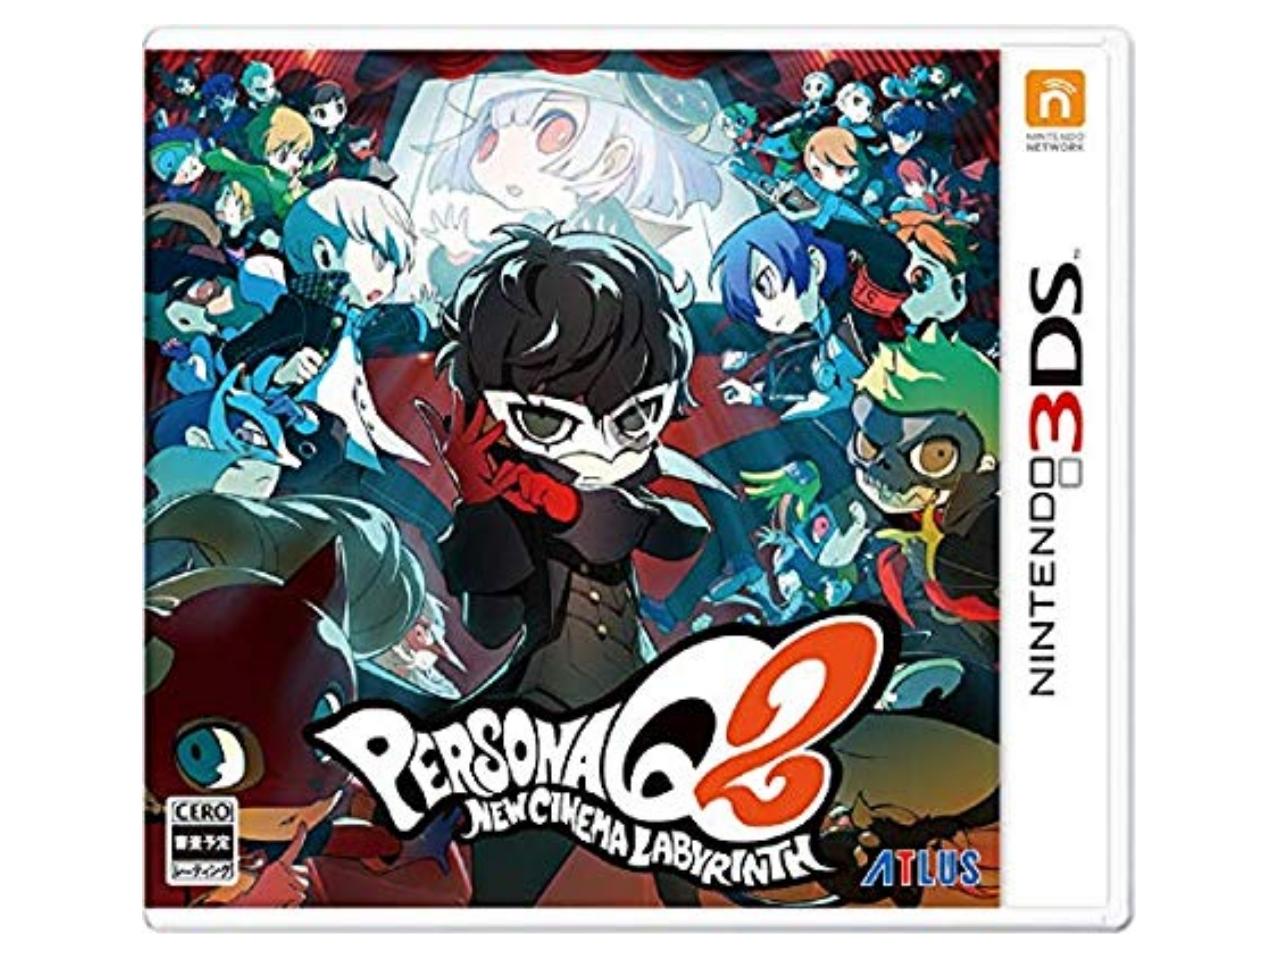 3DS「ペルソナQ2 ニュー シネマ ラビリンス」の予約受付がスタート!